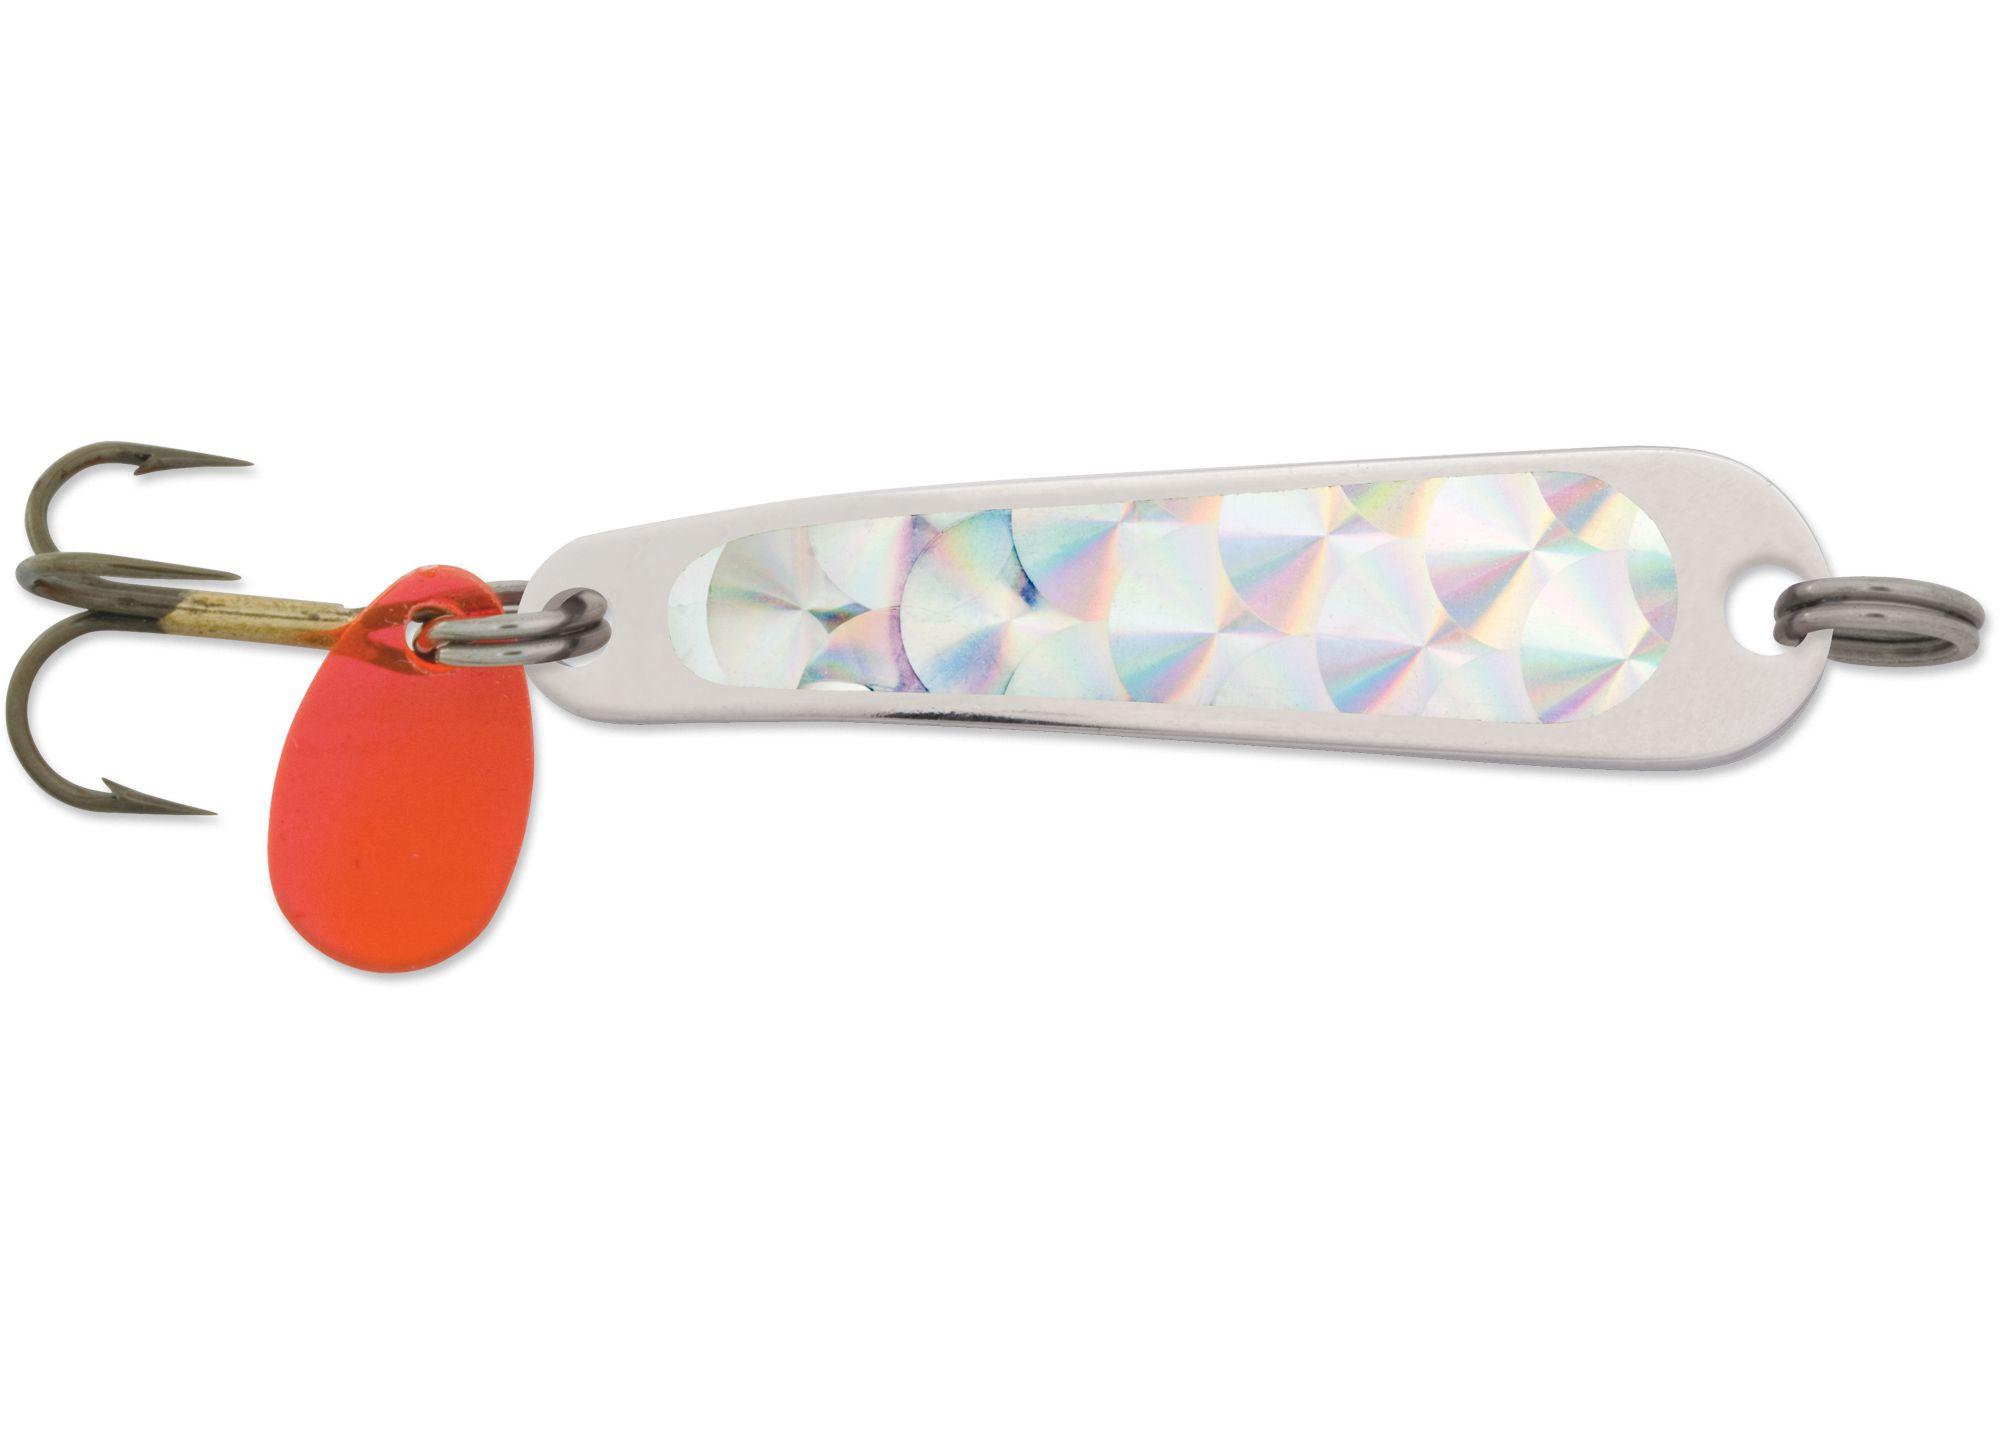 HUS-LURE 112 NICKEL/SILVER PRISM-LITE